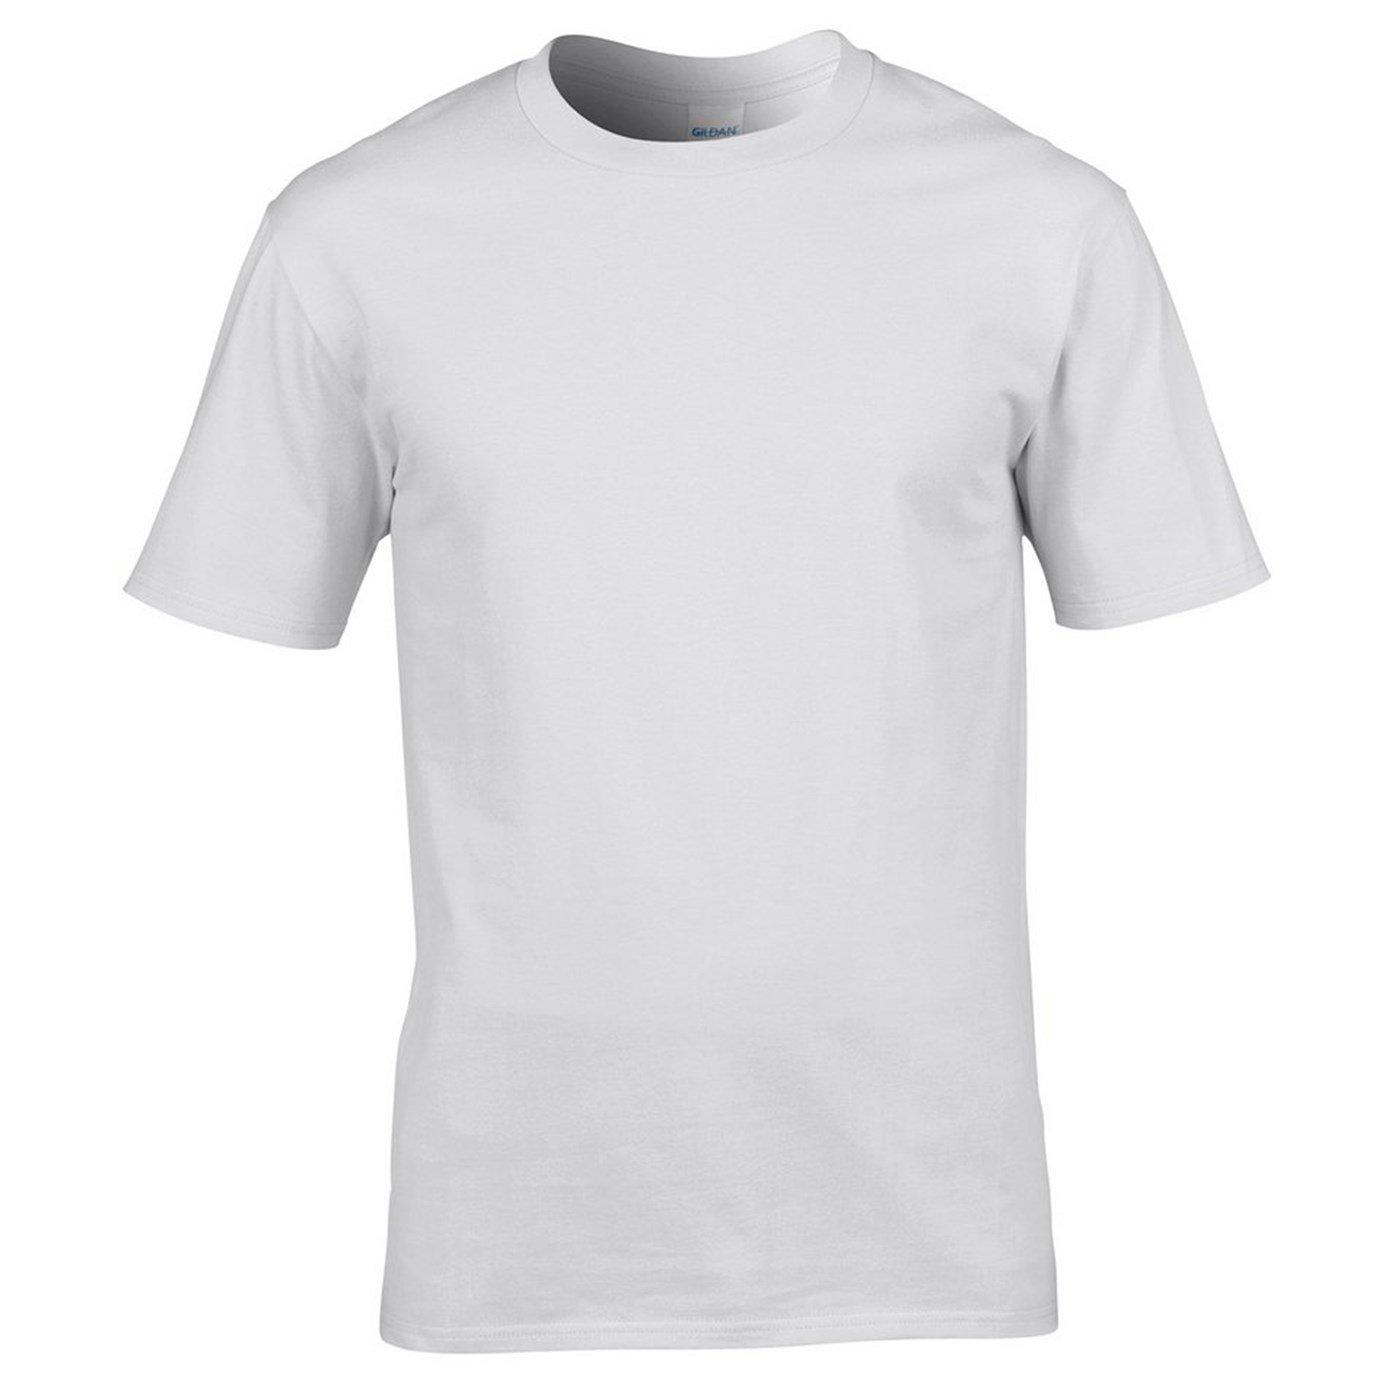 5ea6beee4dfd91 Gildan Adult's Unisex Premium Cotton T-Shirt GD008